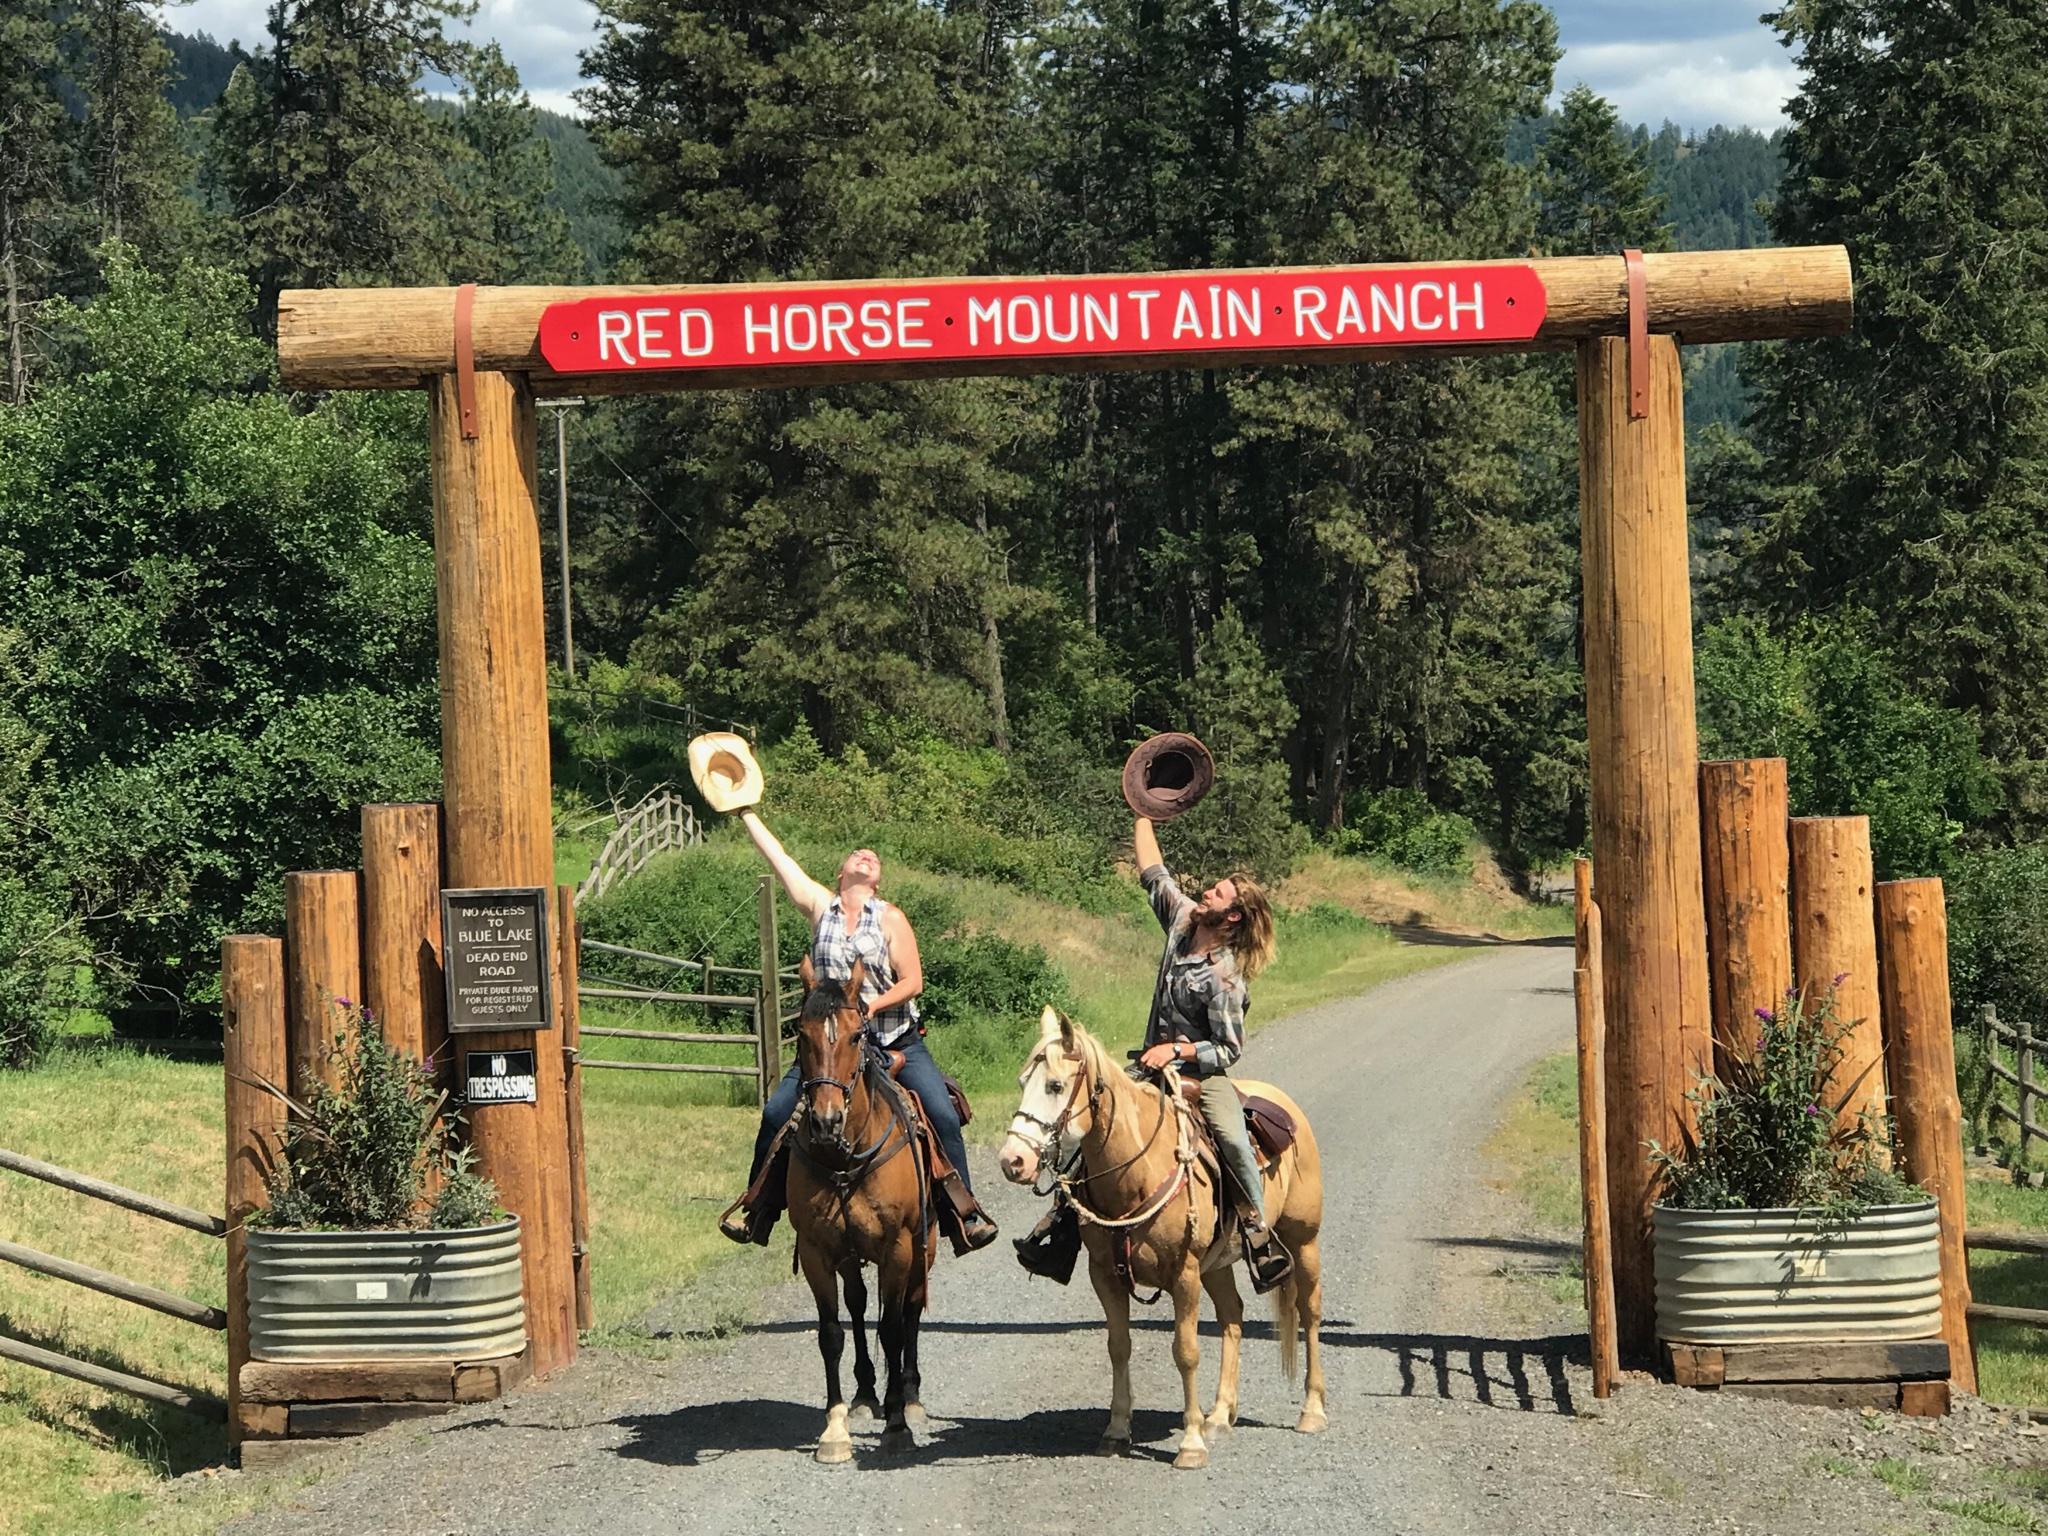 People on horseback under the ranch entrance sign.